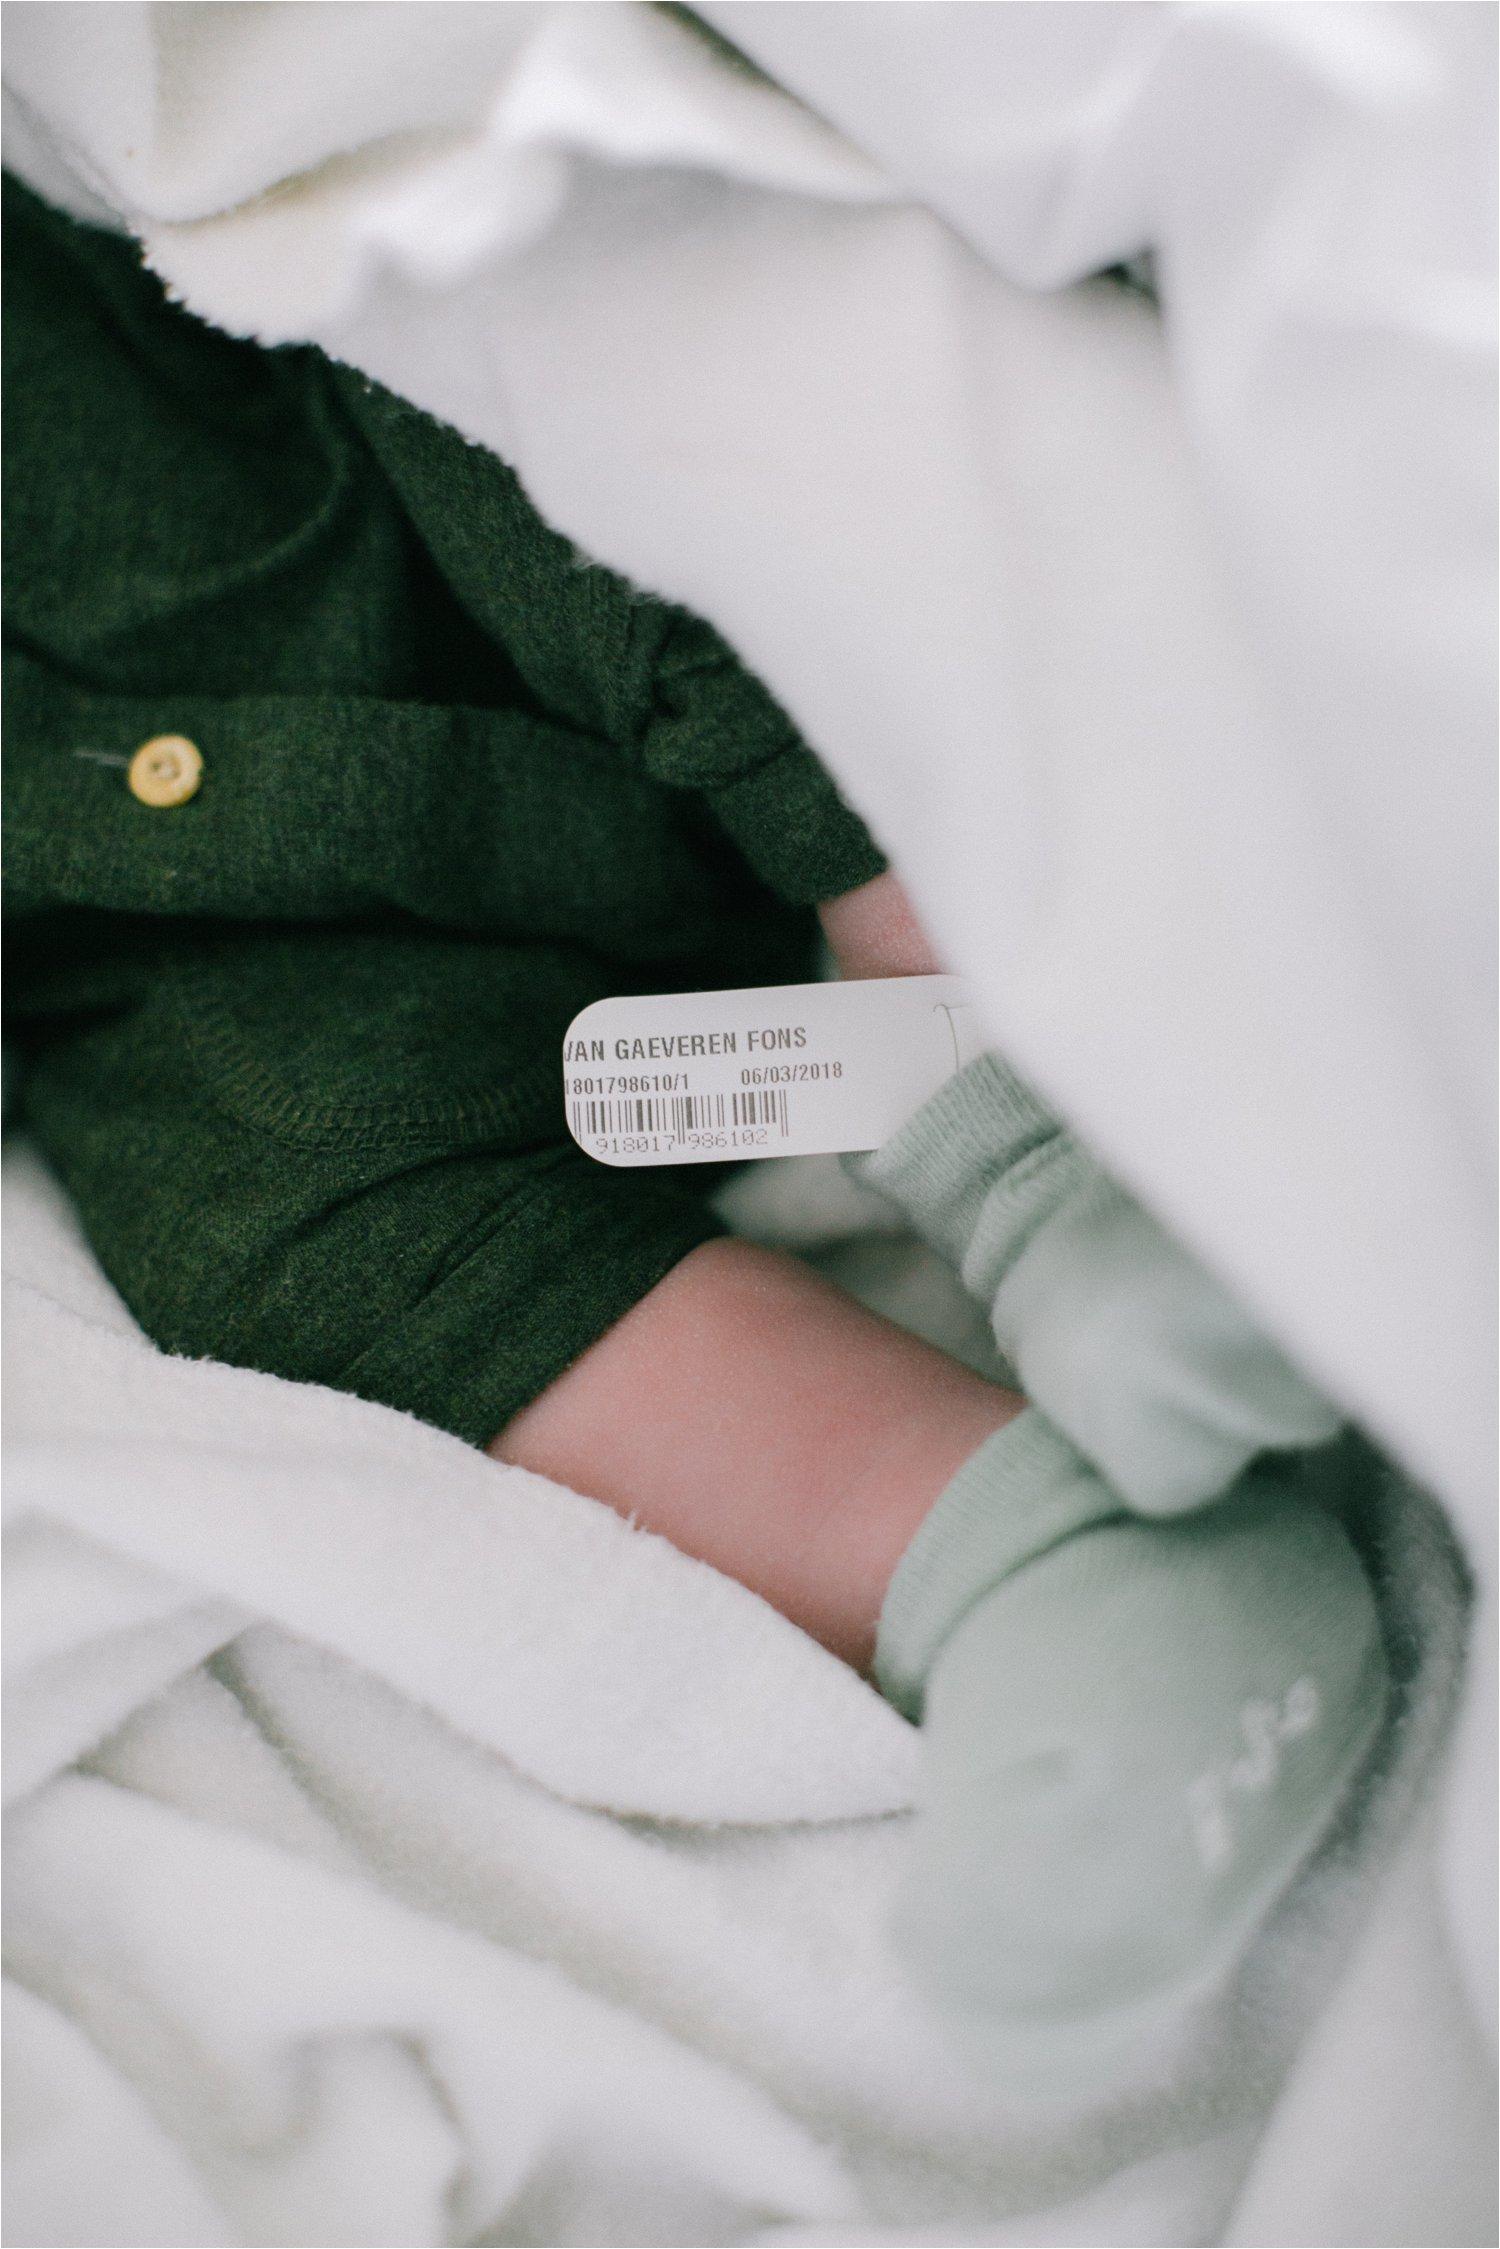 Bevalling Fons